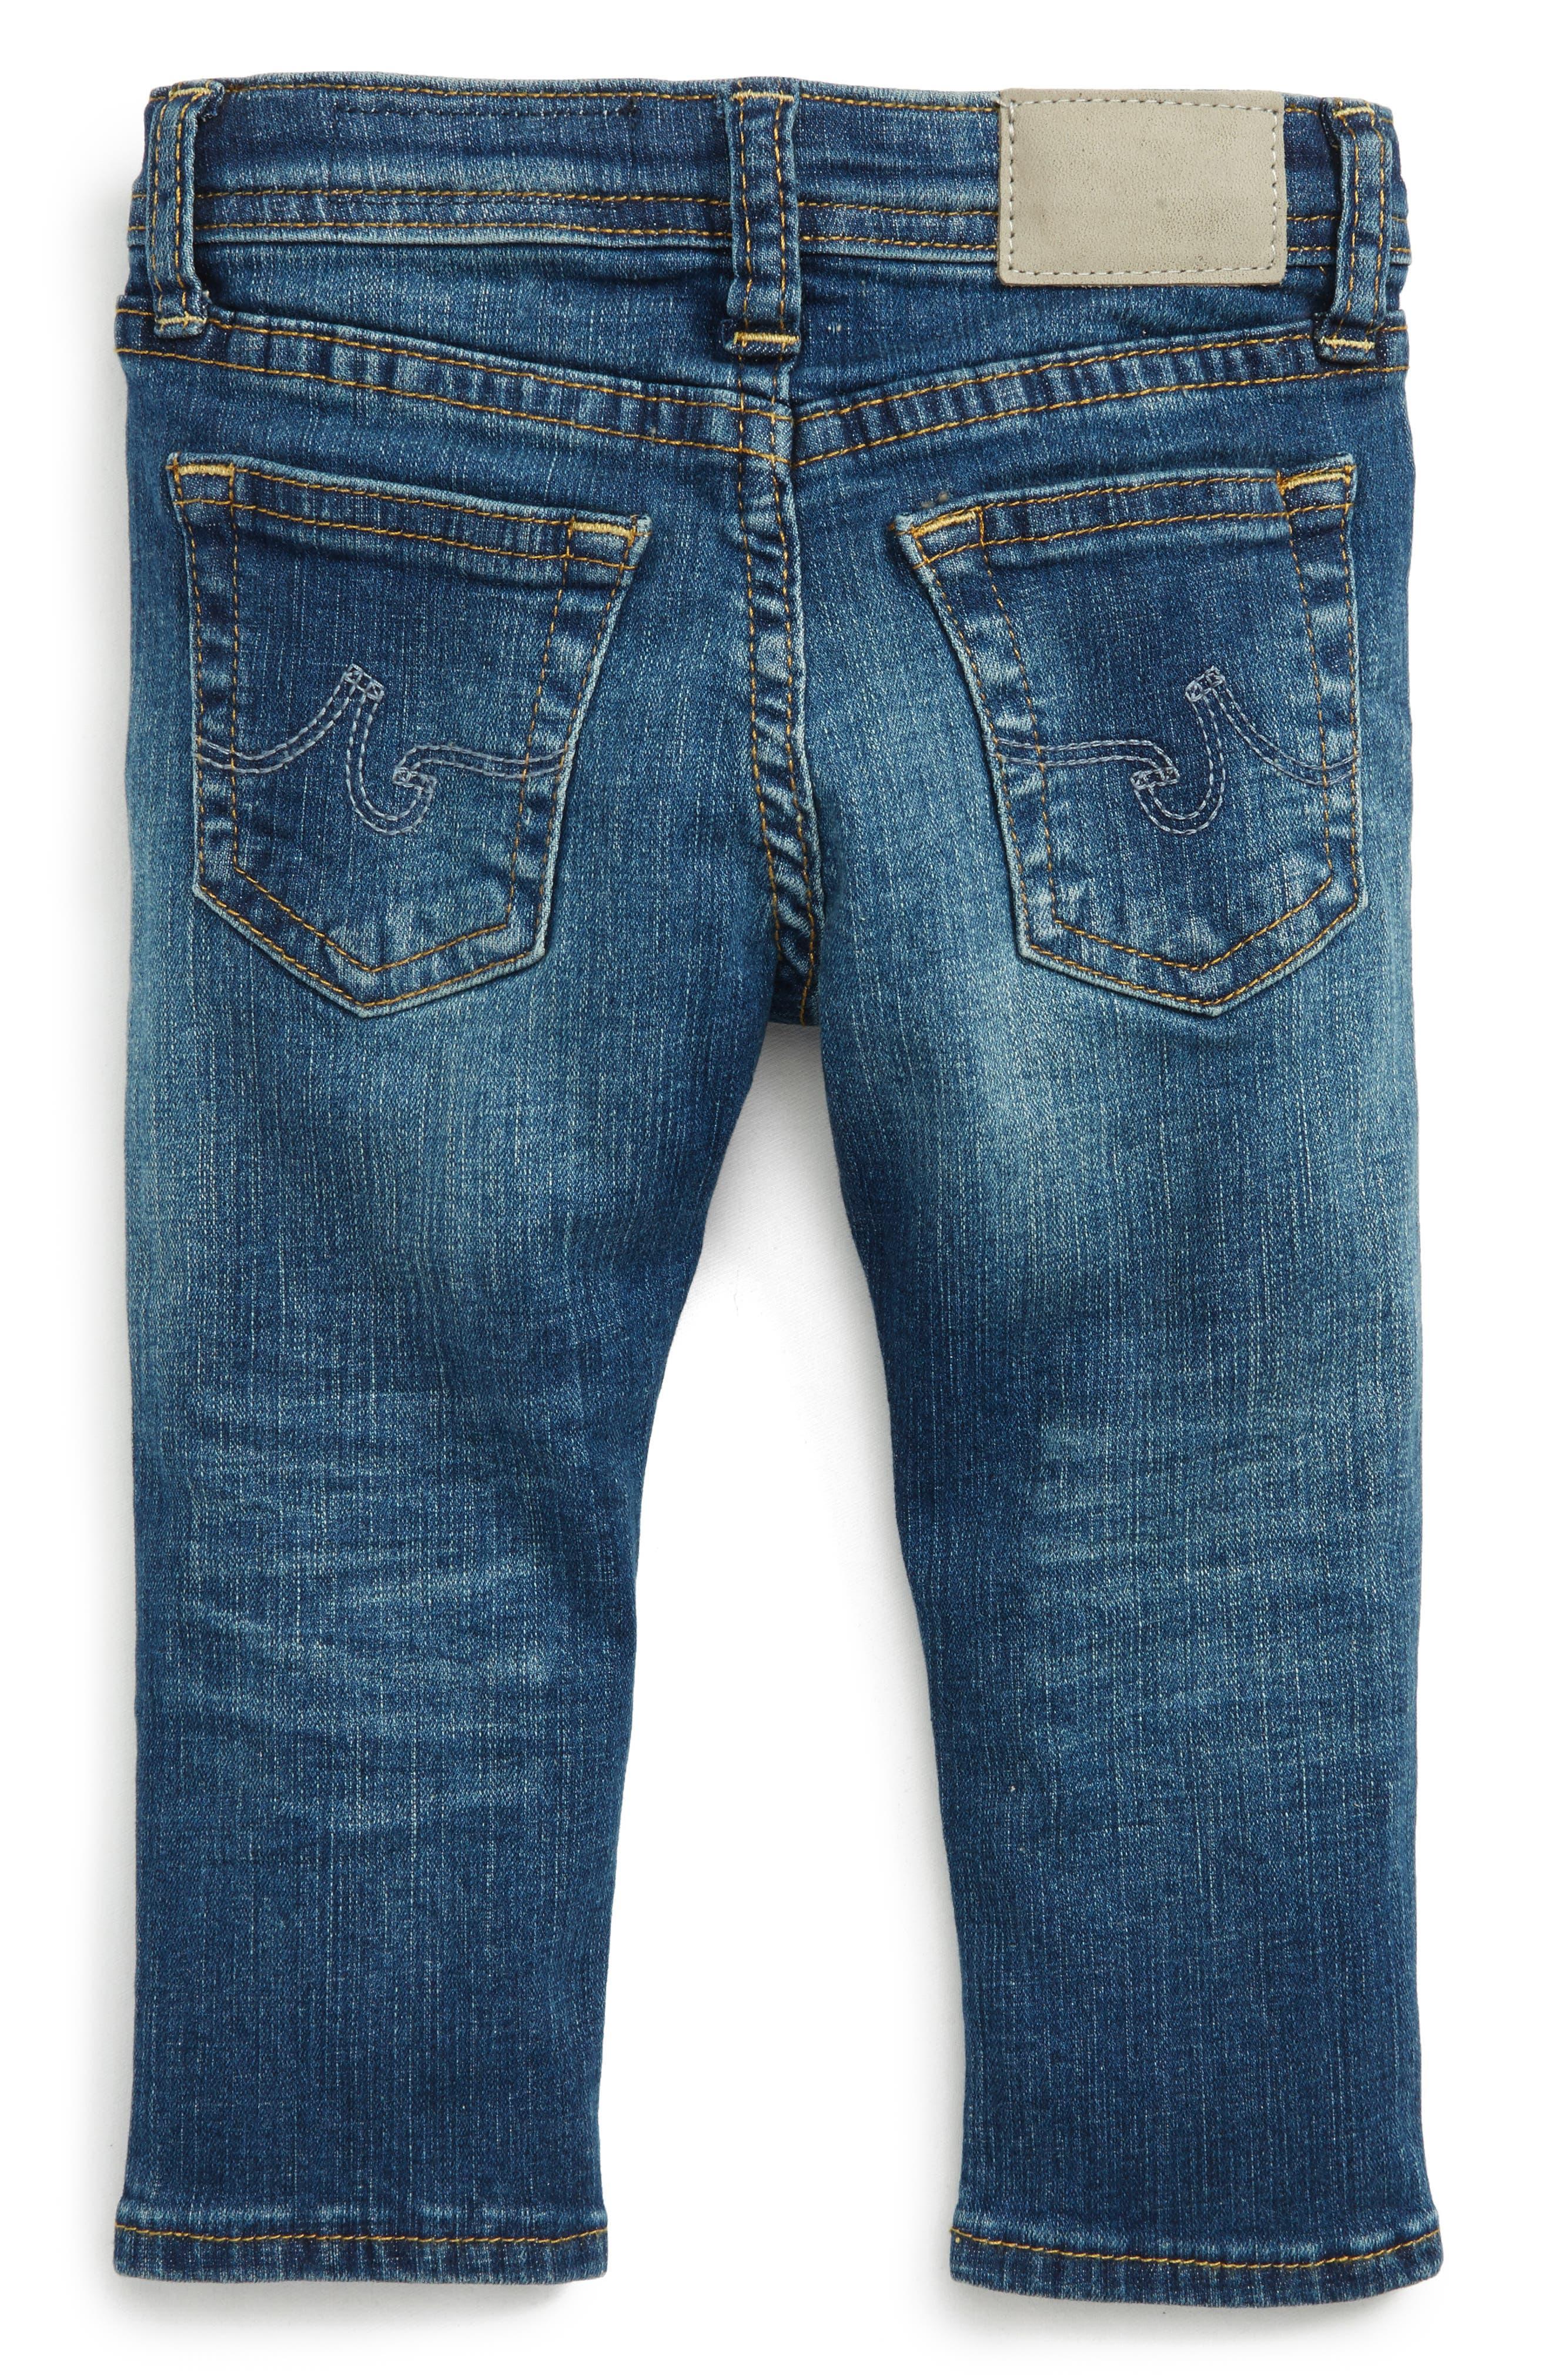 Alternate Image 2  - ag adriano goldschmied kids The Stryker Slim Straight Leg Jeans (Baby Boys)